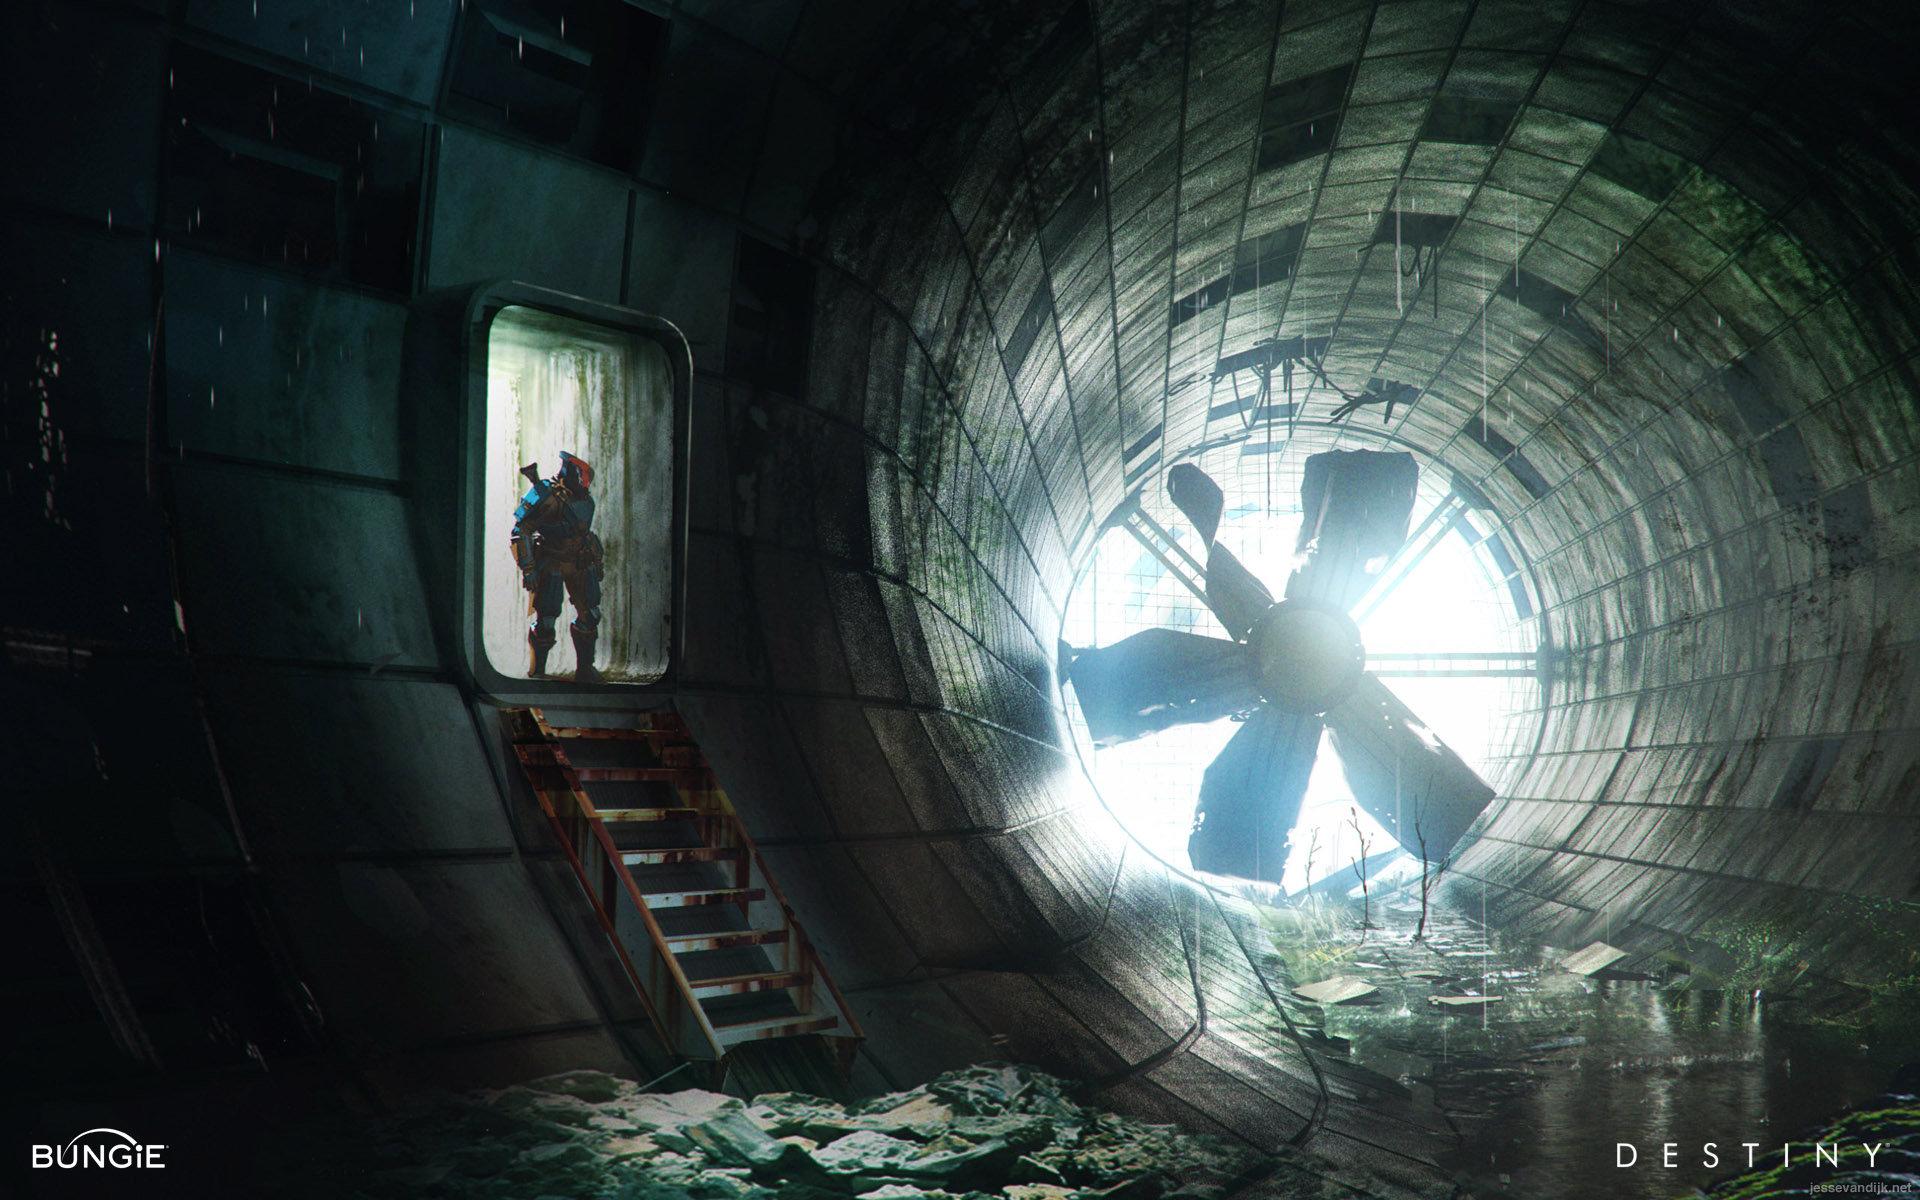 Black Lab Fall Wallpaper Artstation Destiny Inside The Cosmodrome Wall Jesse